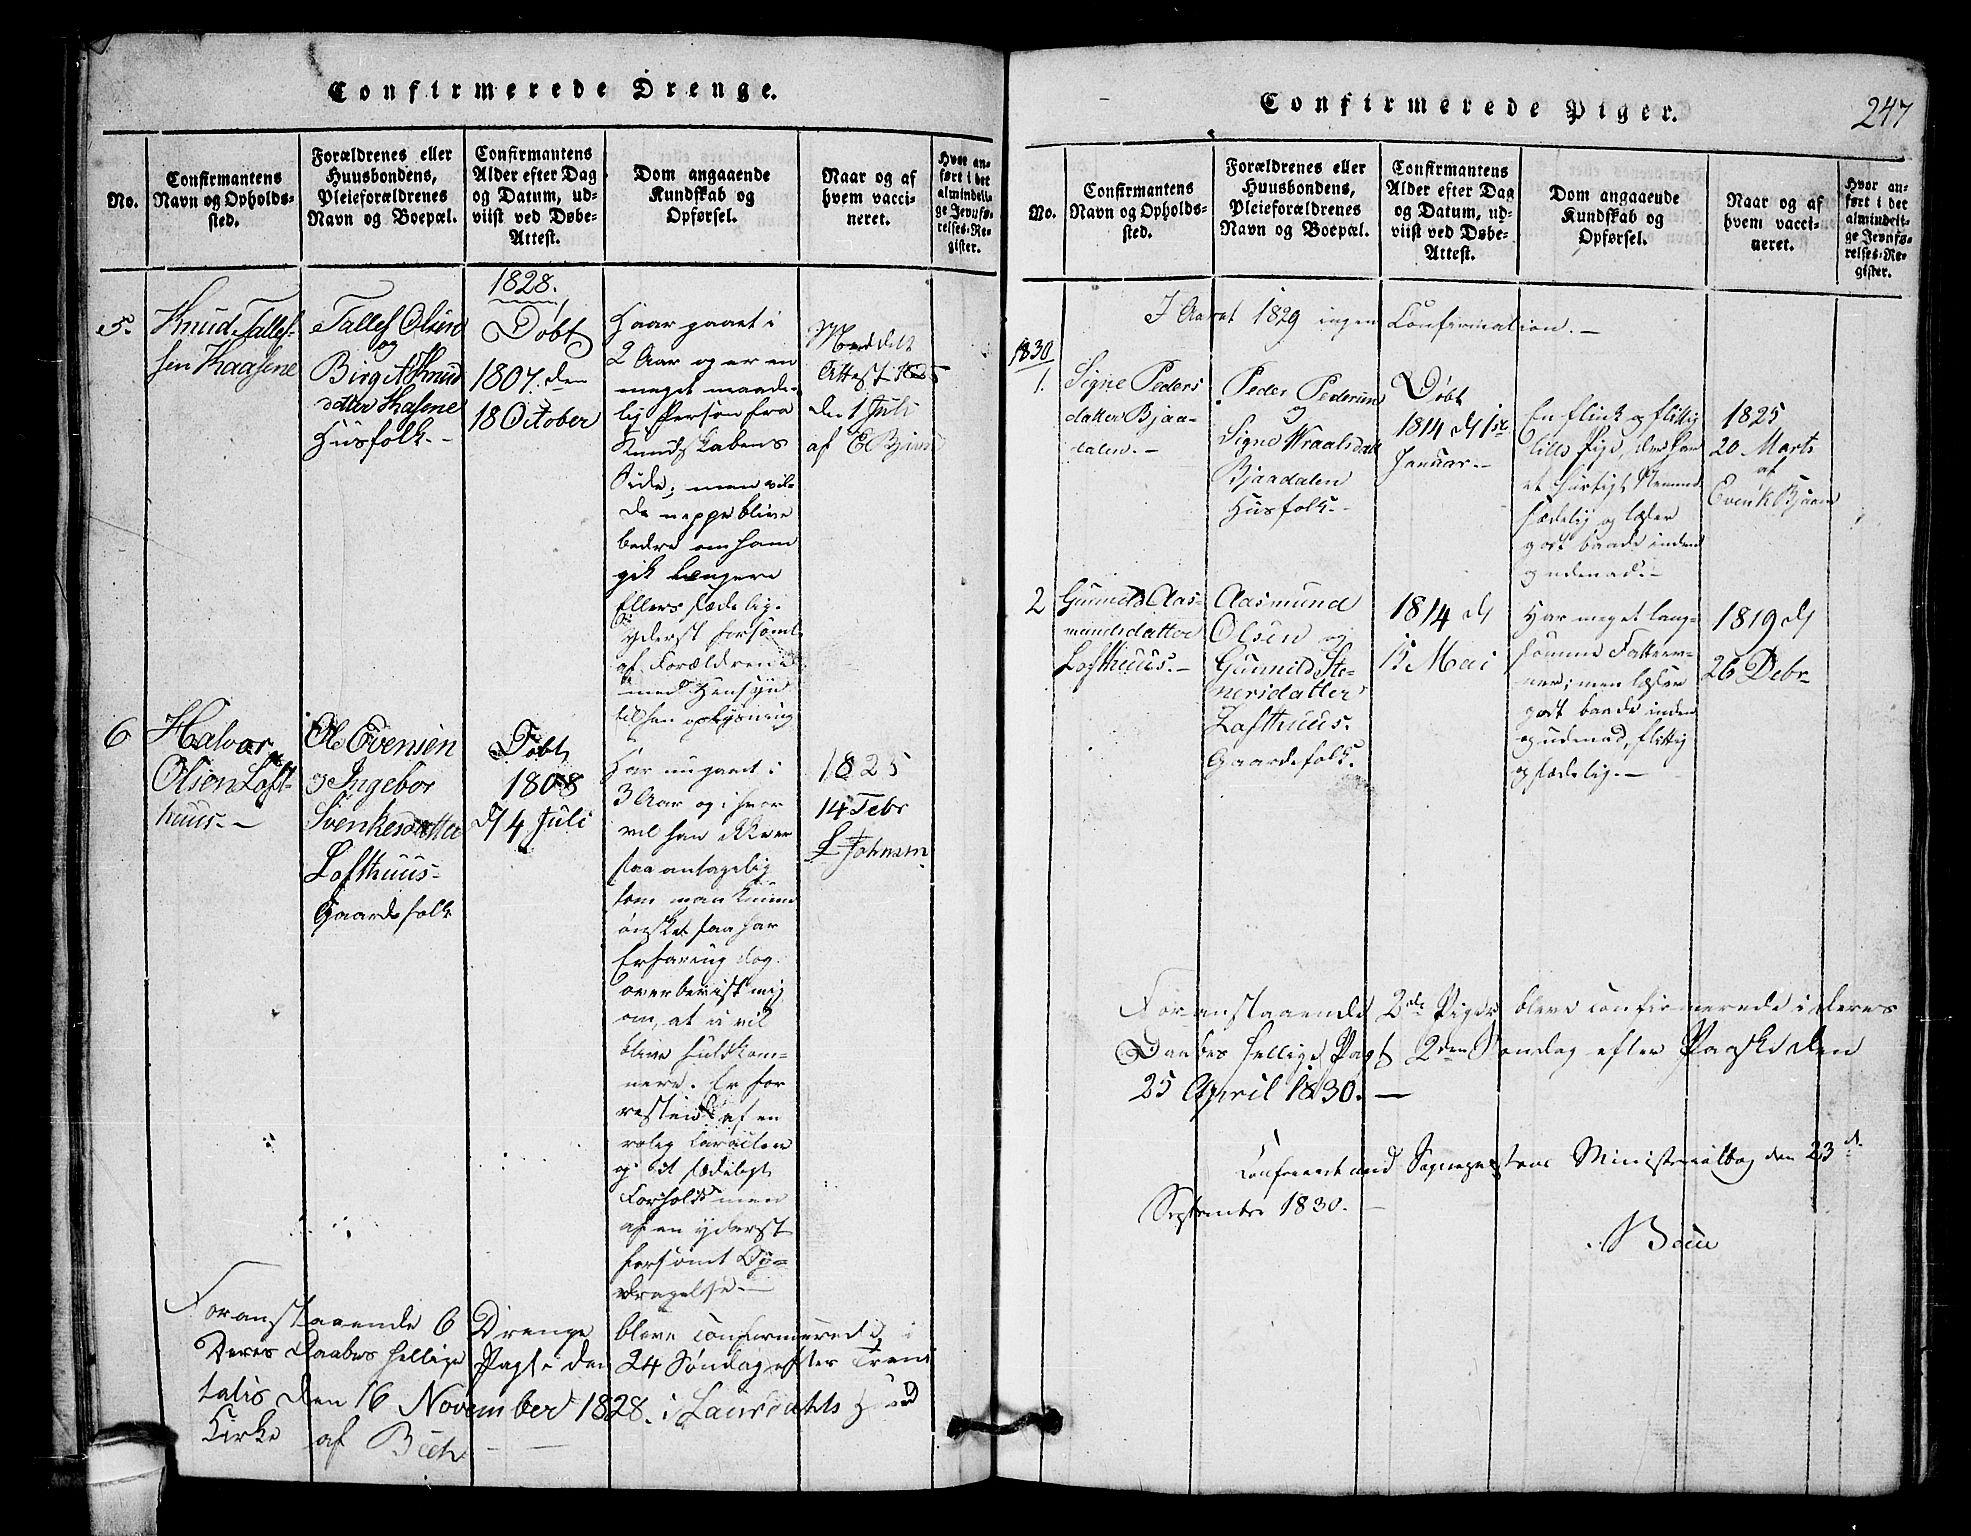 SAKO, Lårdal kirkebøker, G/Gb/L0001: Klokkerbok nr. II 1, 1815-1865, s. 247